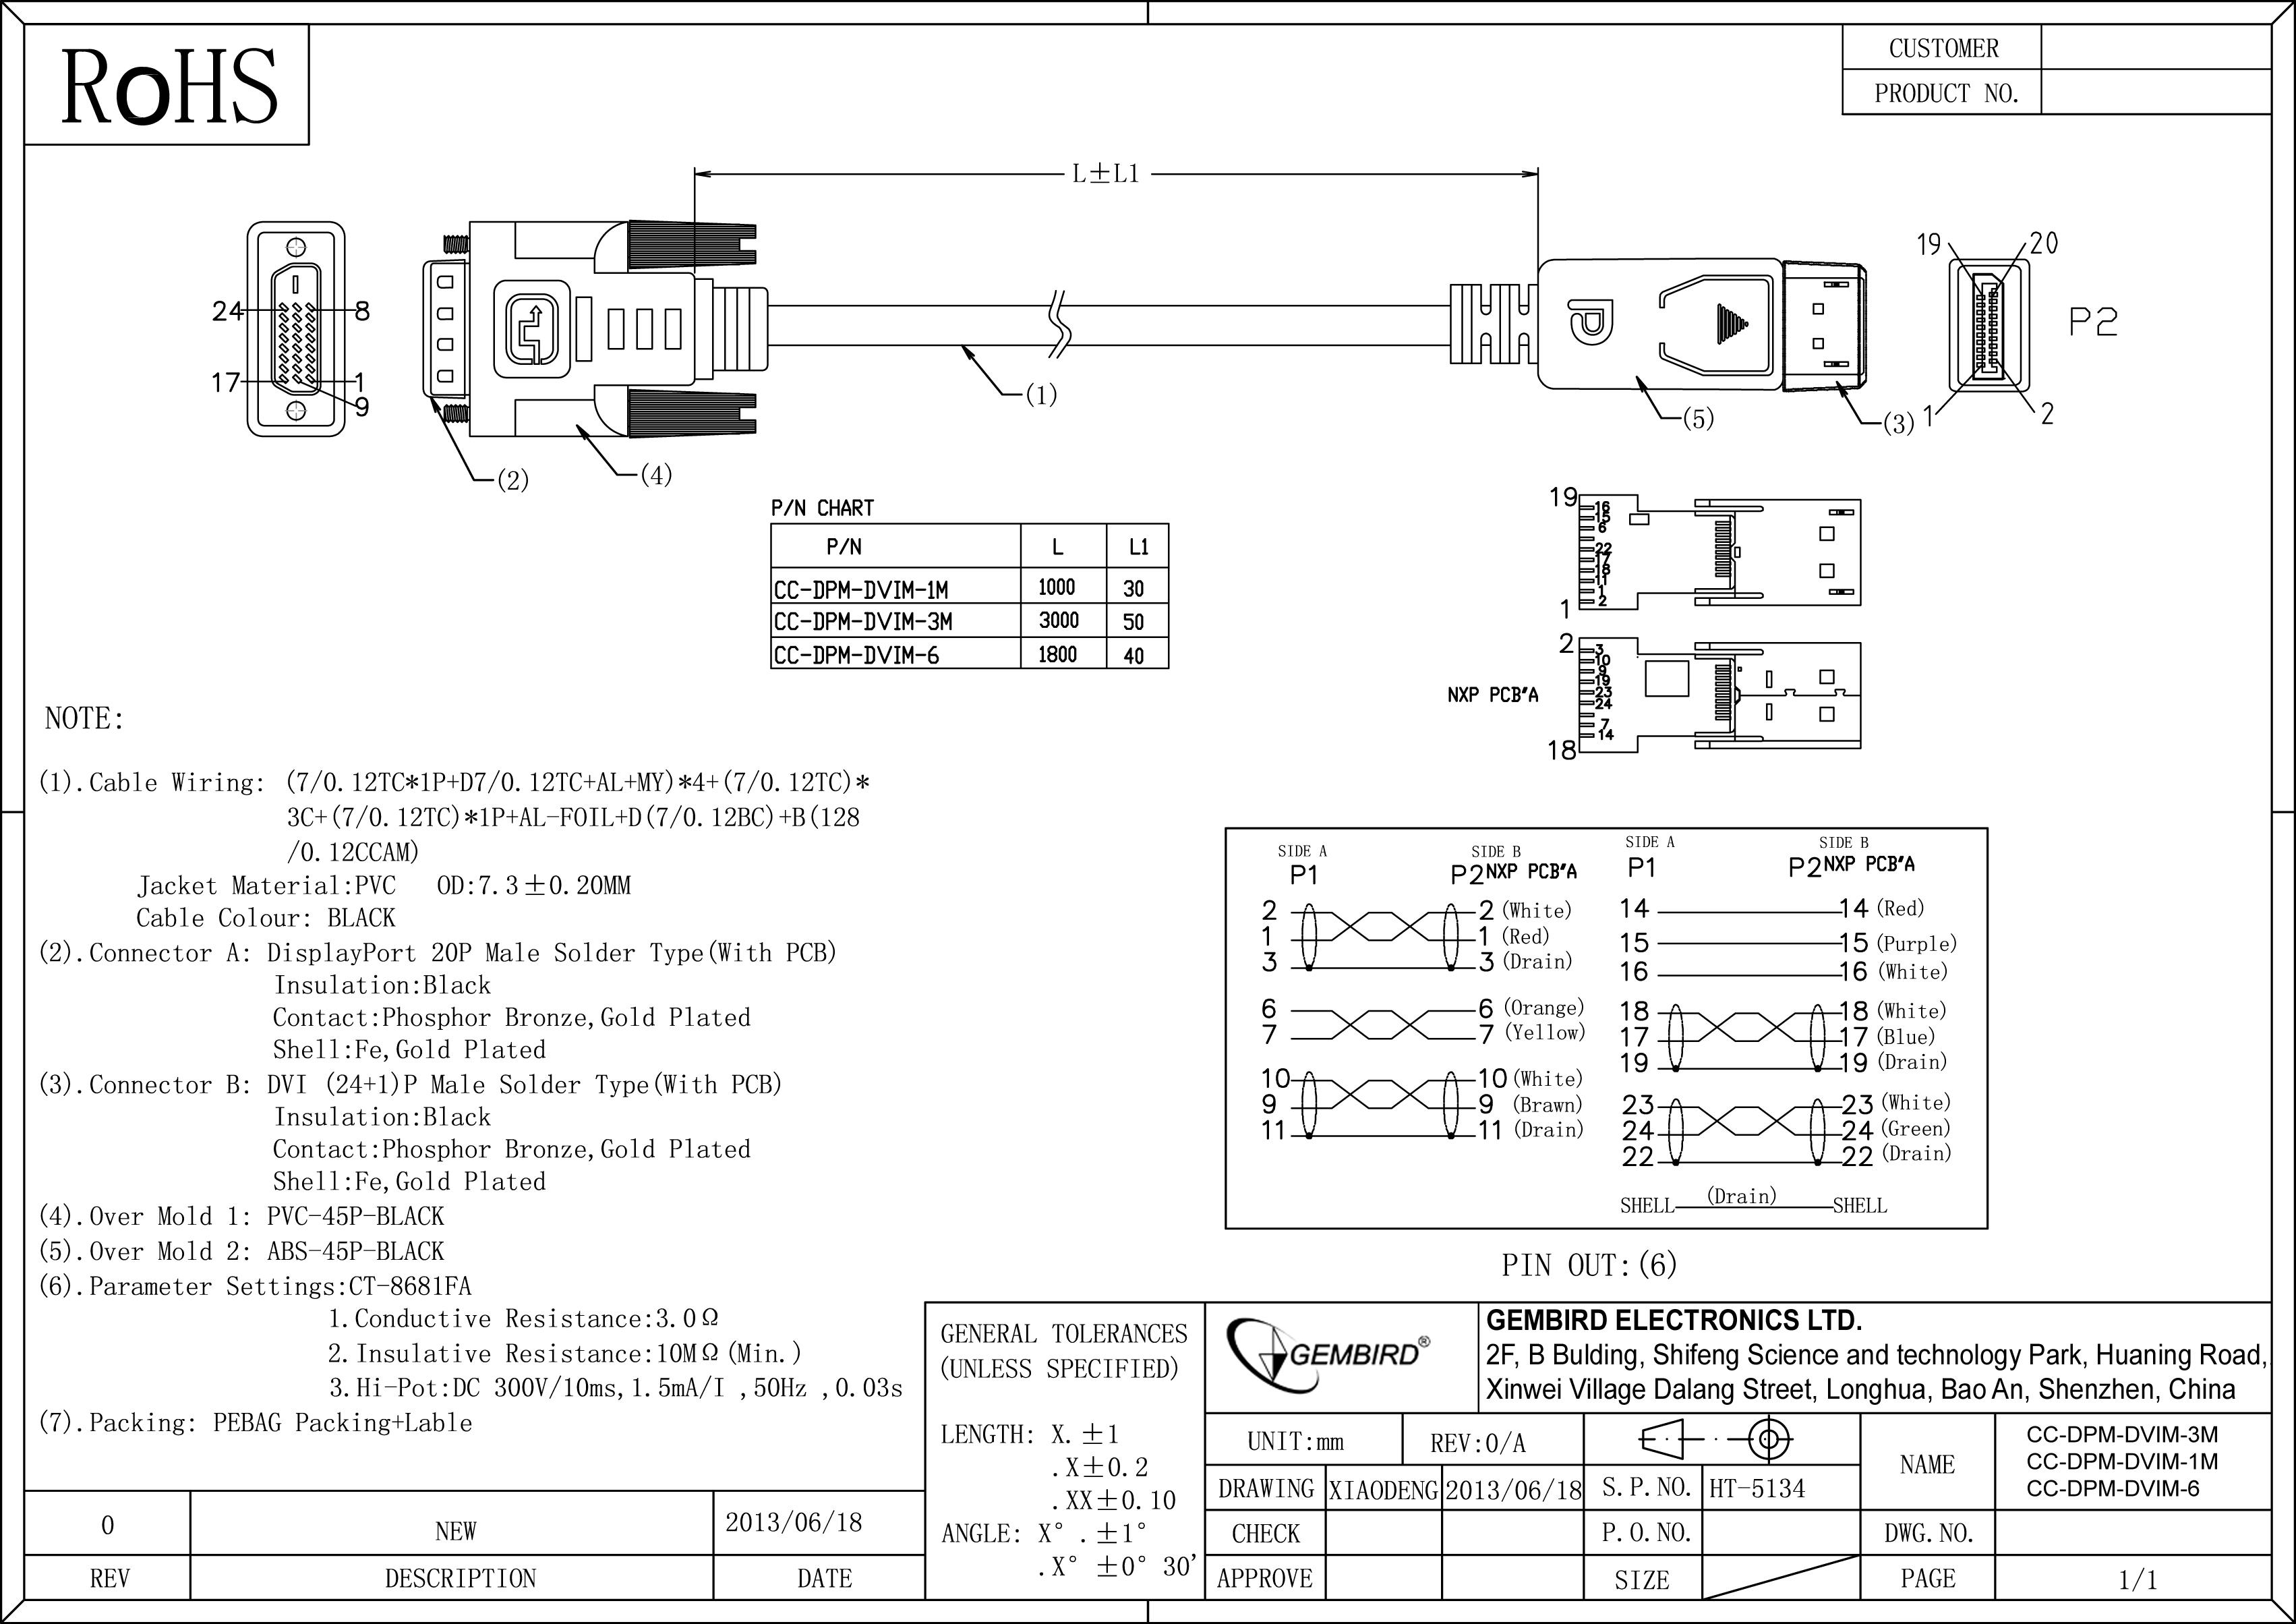 cf_additional_info---788c9111-e670-4fa4-906e-df3fabc442f5 Usb Wiring Diagram on usb 3 pinout, usb 2.0 pinout, usb connections diagram, usb 2.0 dimensions, usb pin diagram, usb cable pinout, usb hub wiring diagram, usb motherboard wiring-diagram, usb port wiring-diagram, usb otg wiring diagram, usb cable diagram, micro usb wiring diagram, usb female pinout, usb wire color diagram, usb to ethernet wiring diagram, mini usb wiring diagram, usb wire diagram and function, usb pinout diagram, usb plug wiring diagram,